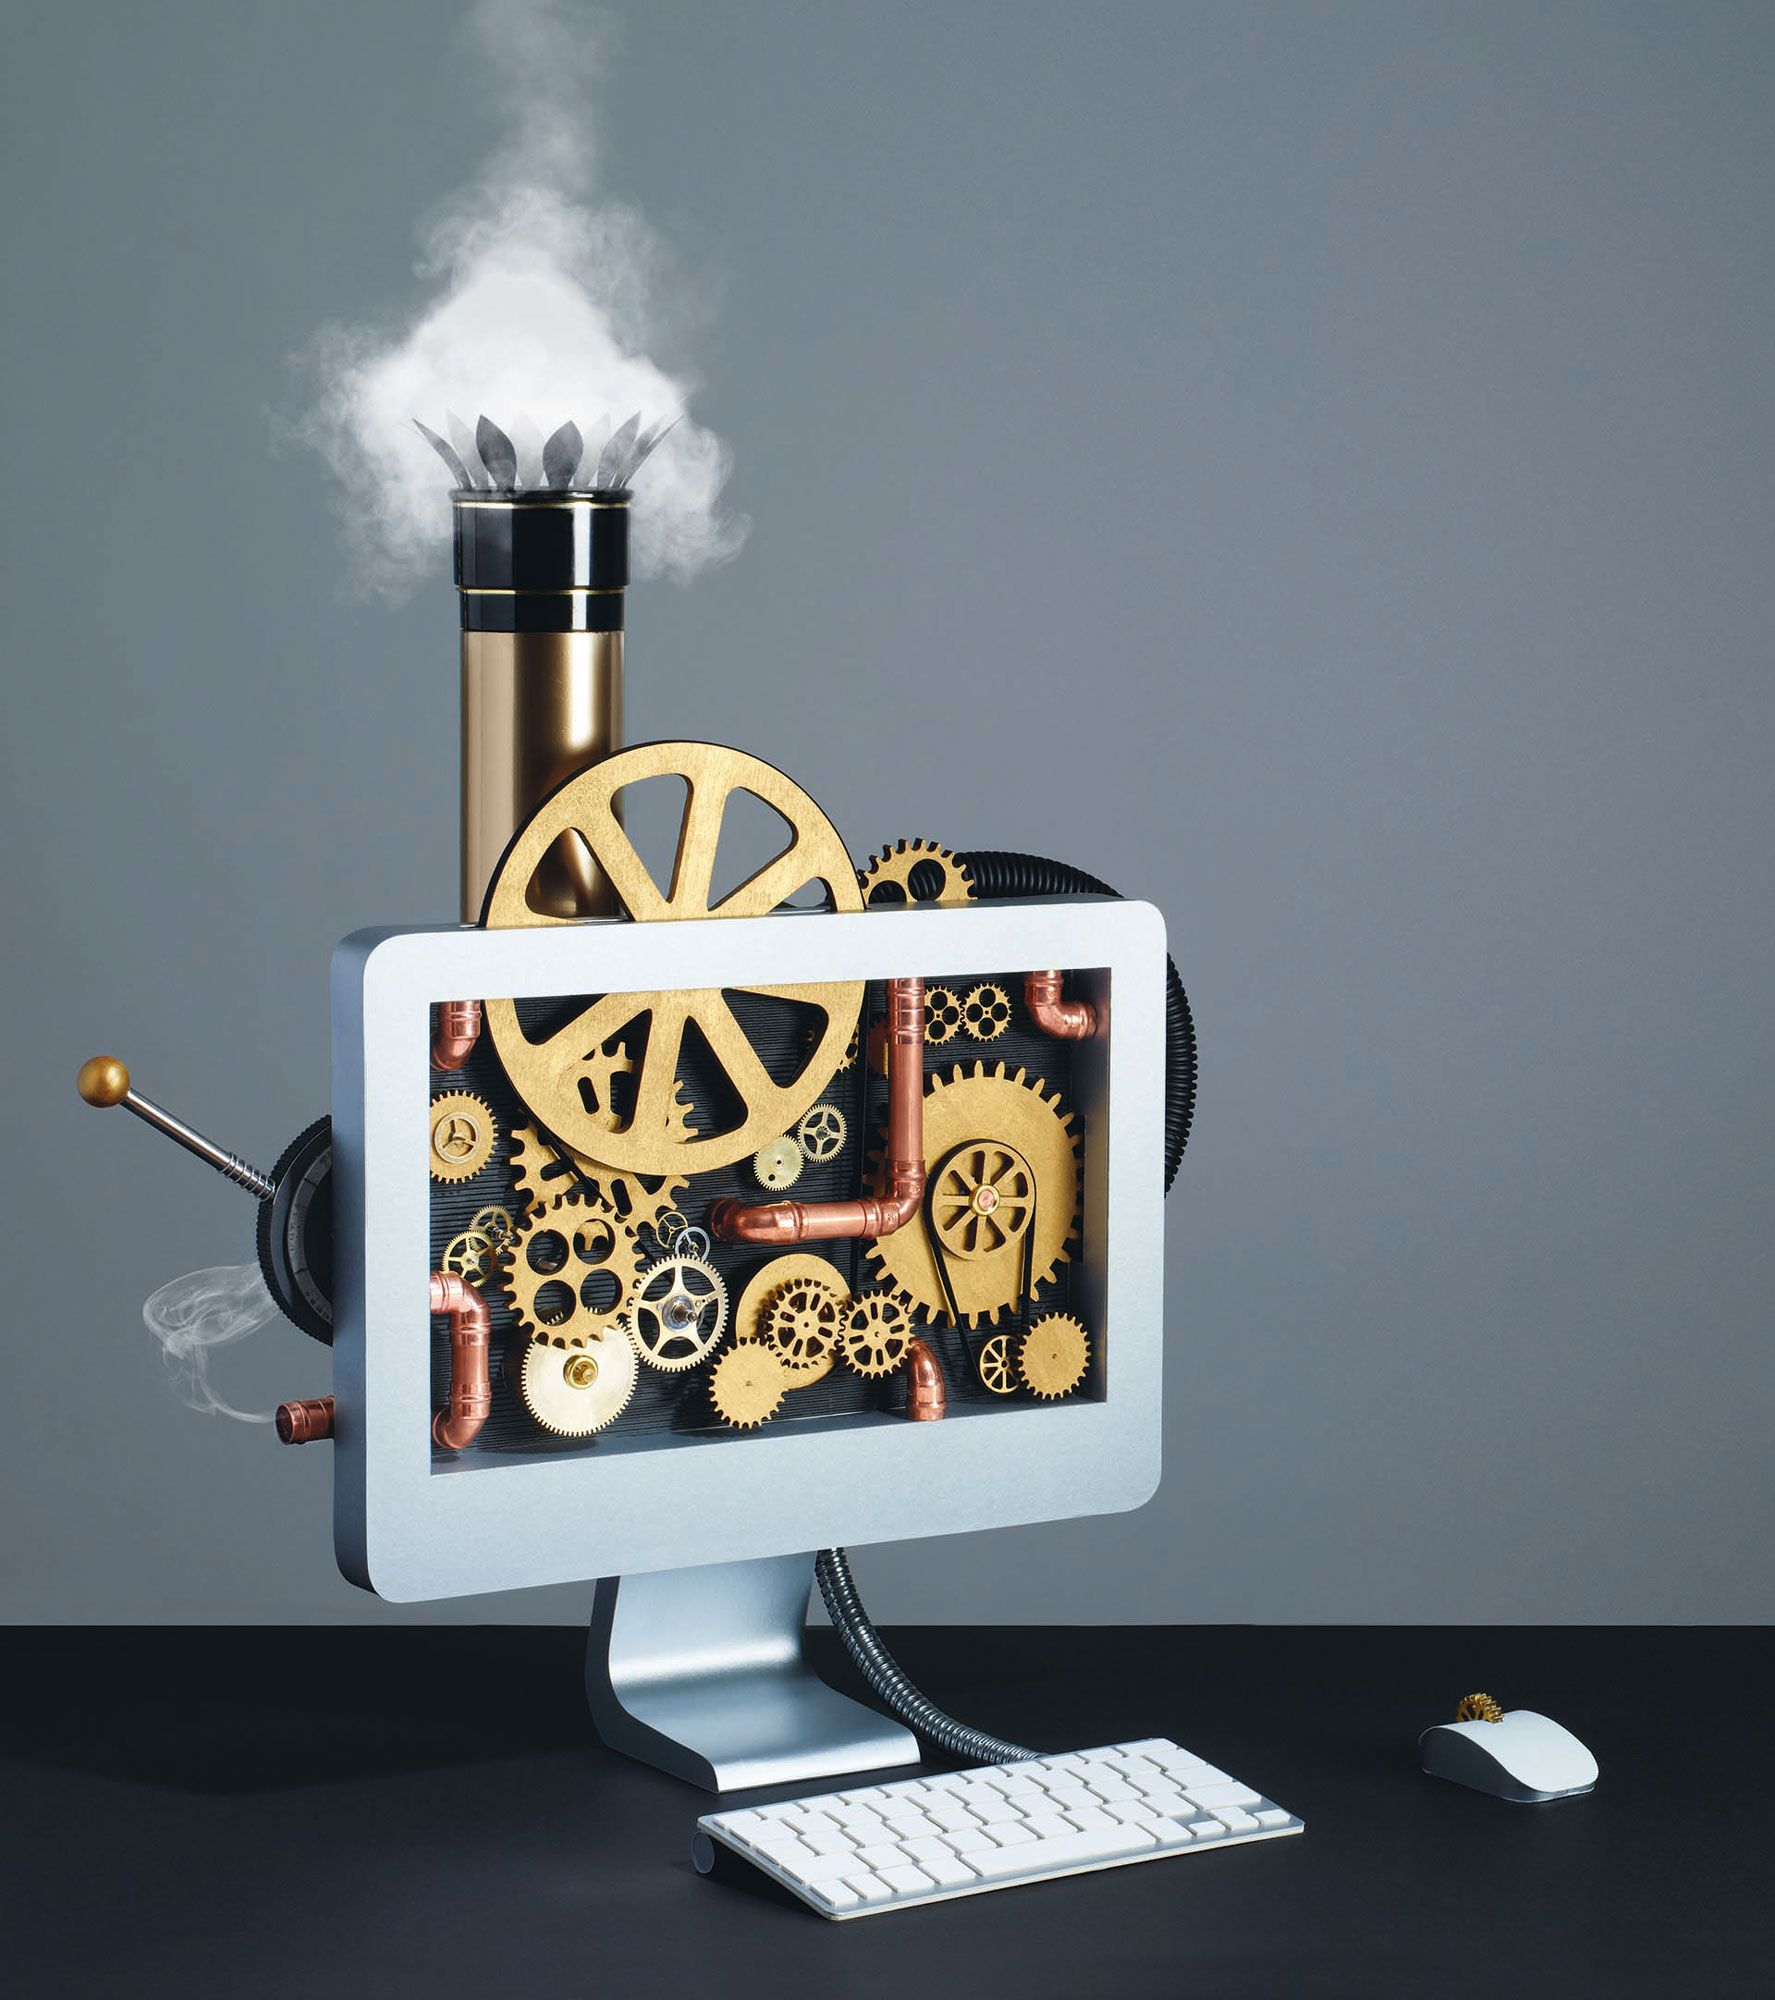 Pin by Lauren Nigri on Image ideas Industrial revolution